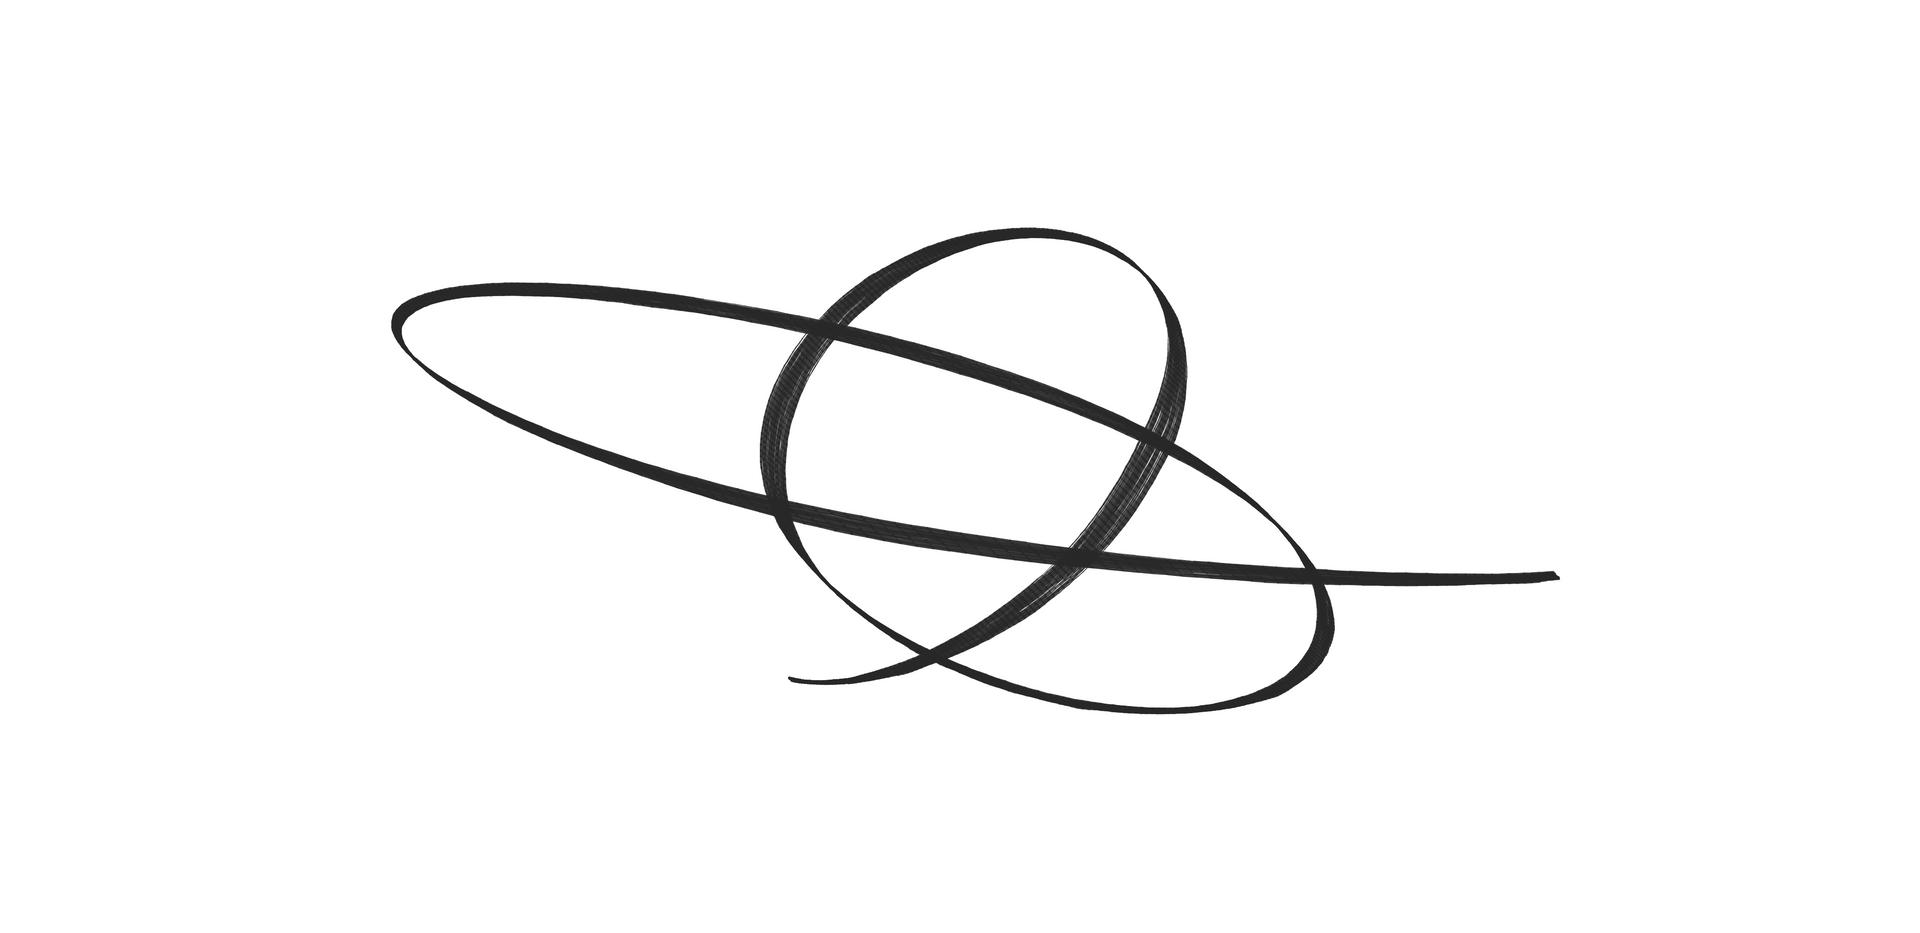 orbital calligraphy 2